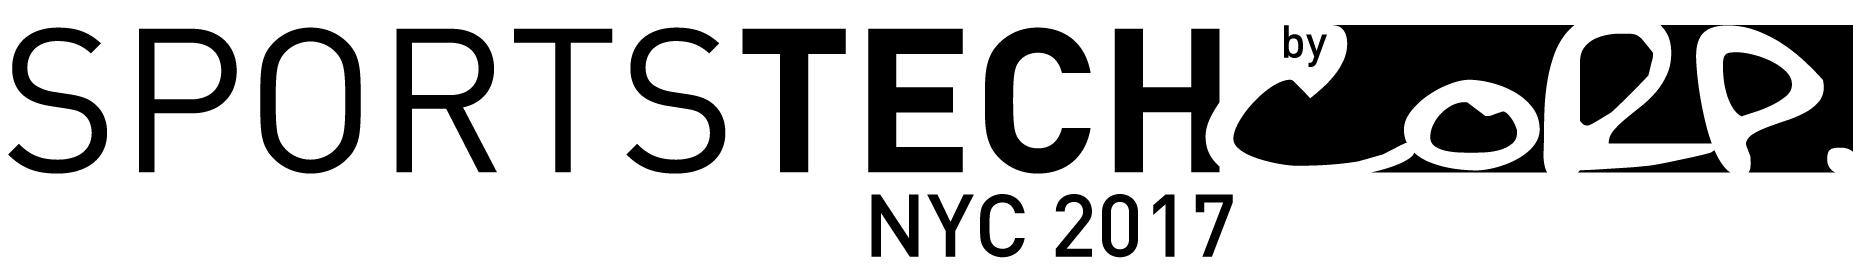 SportsTech NYC logo black